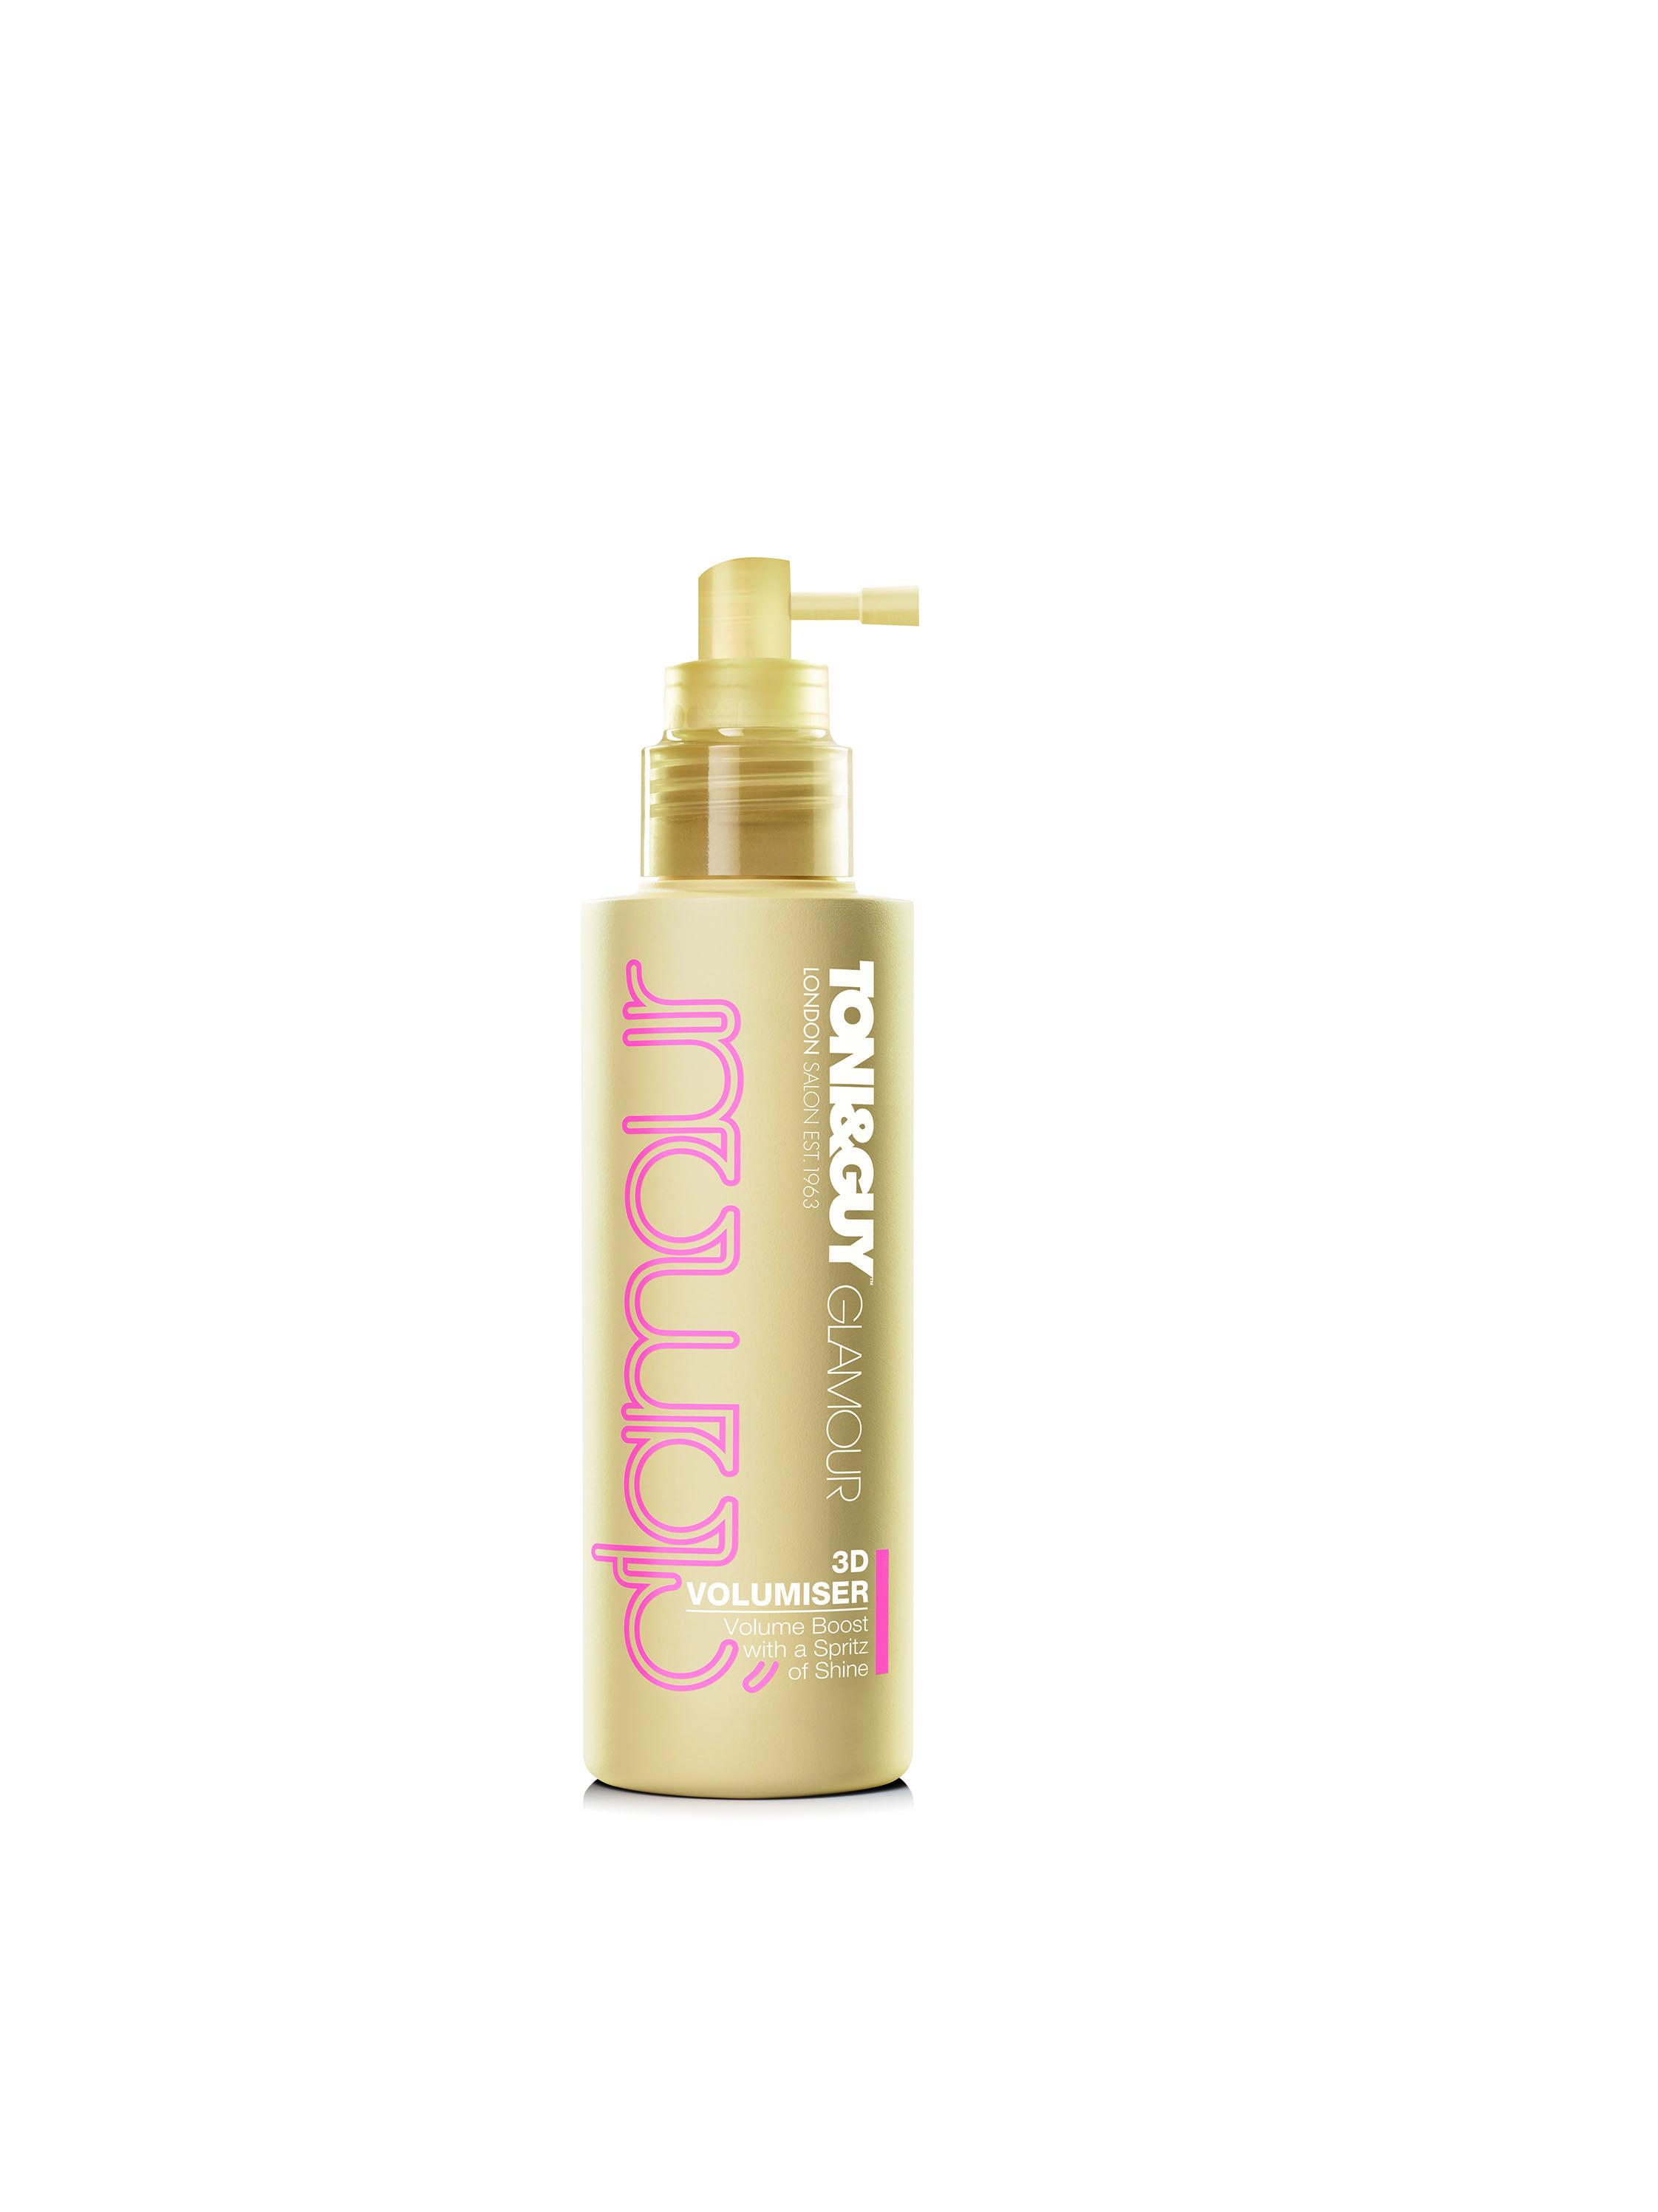 TONI&GUY Hair Care Glamour 3D Volumiser RRP 15.99 Tonies